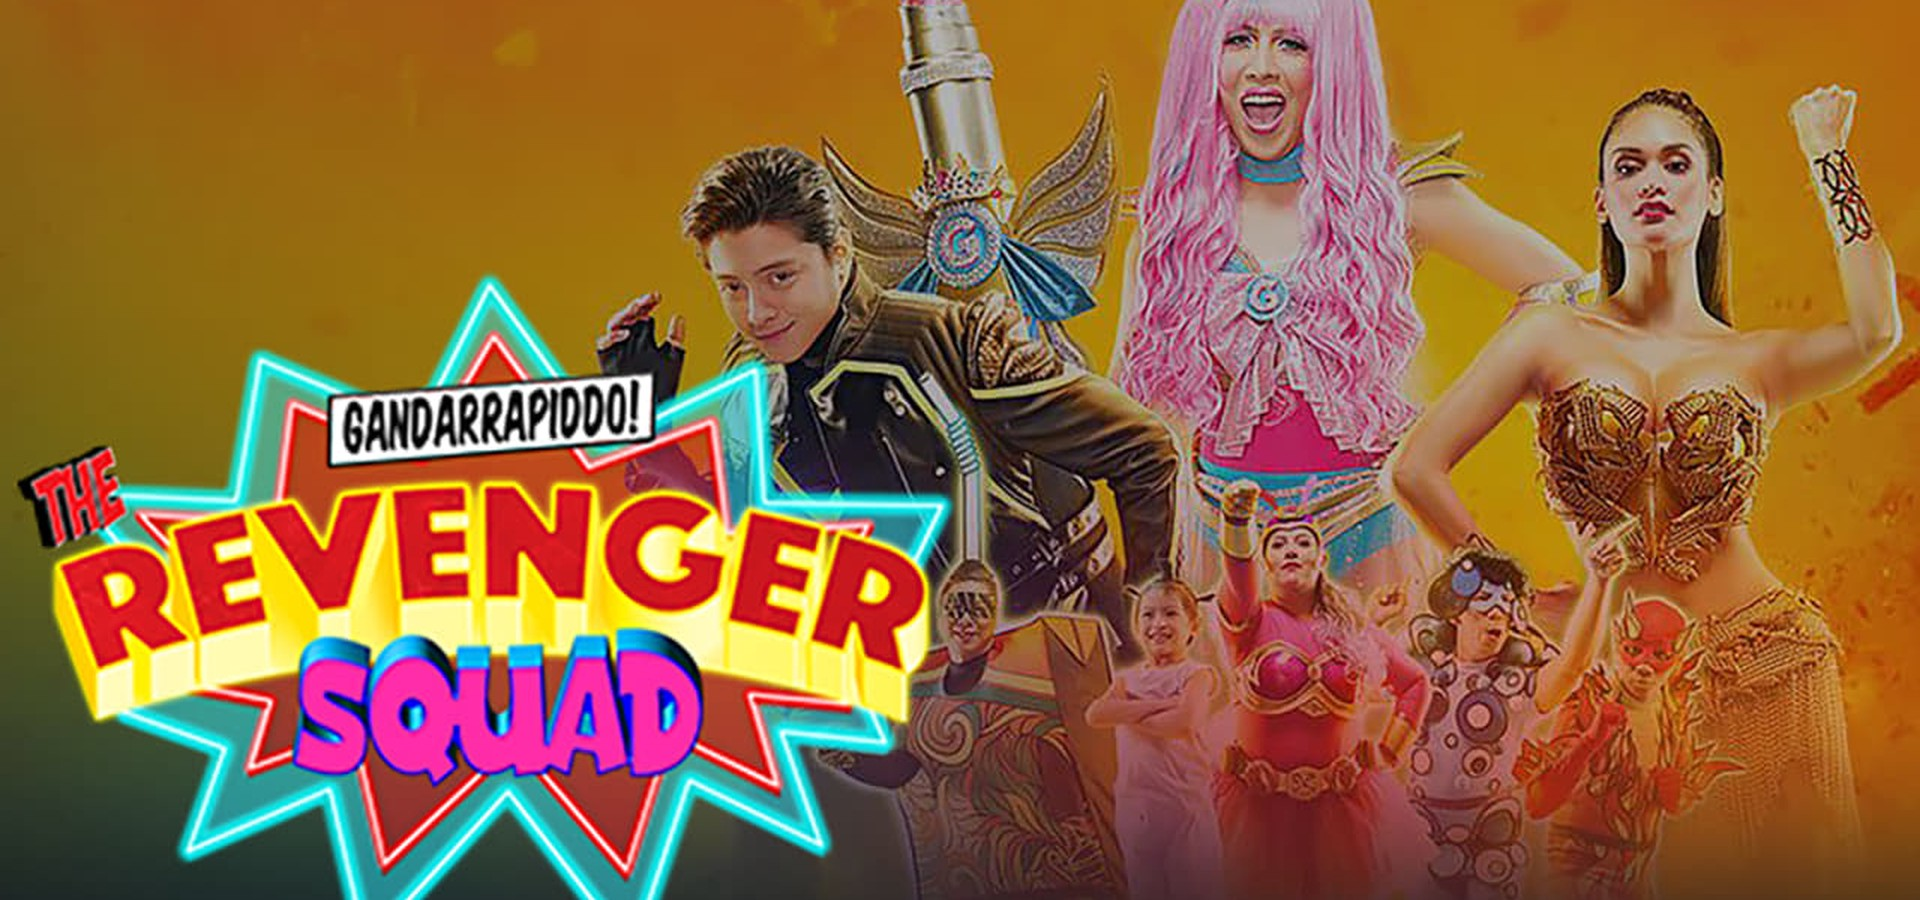 Gandarrapiddo!: The Revenger Squad